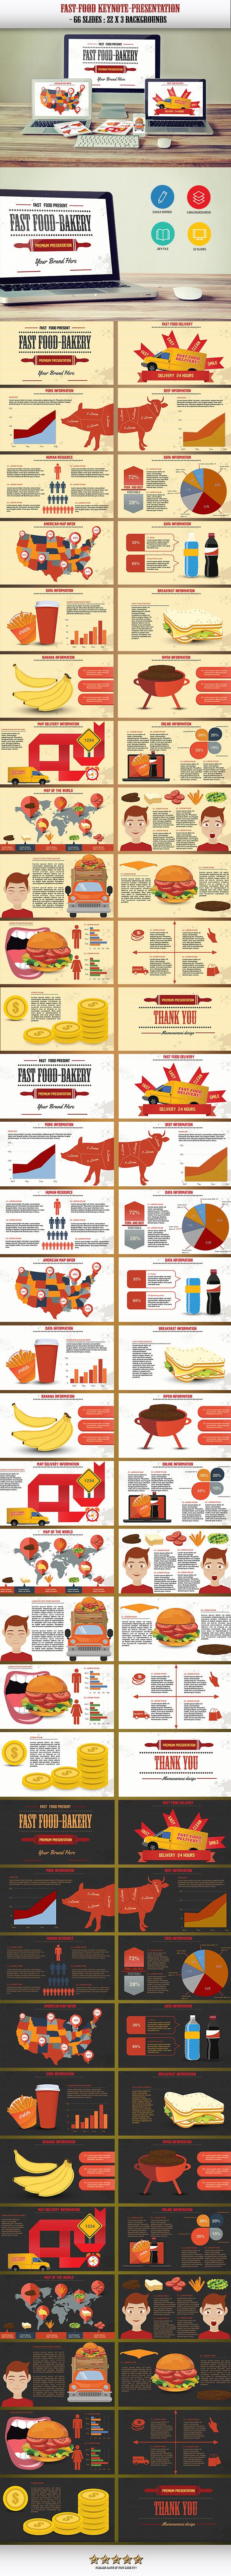 GraphicRiver Fast Food Keynote Presentation 10117794